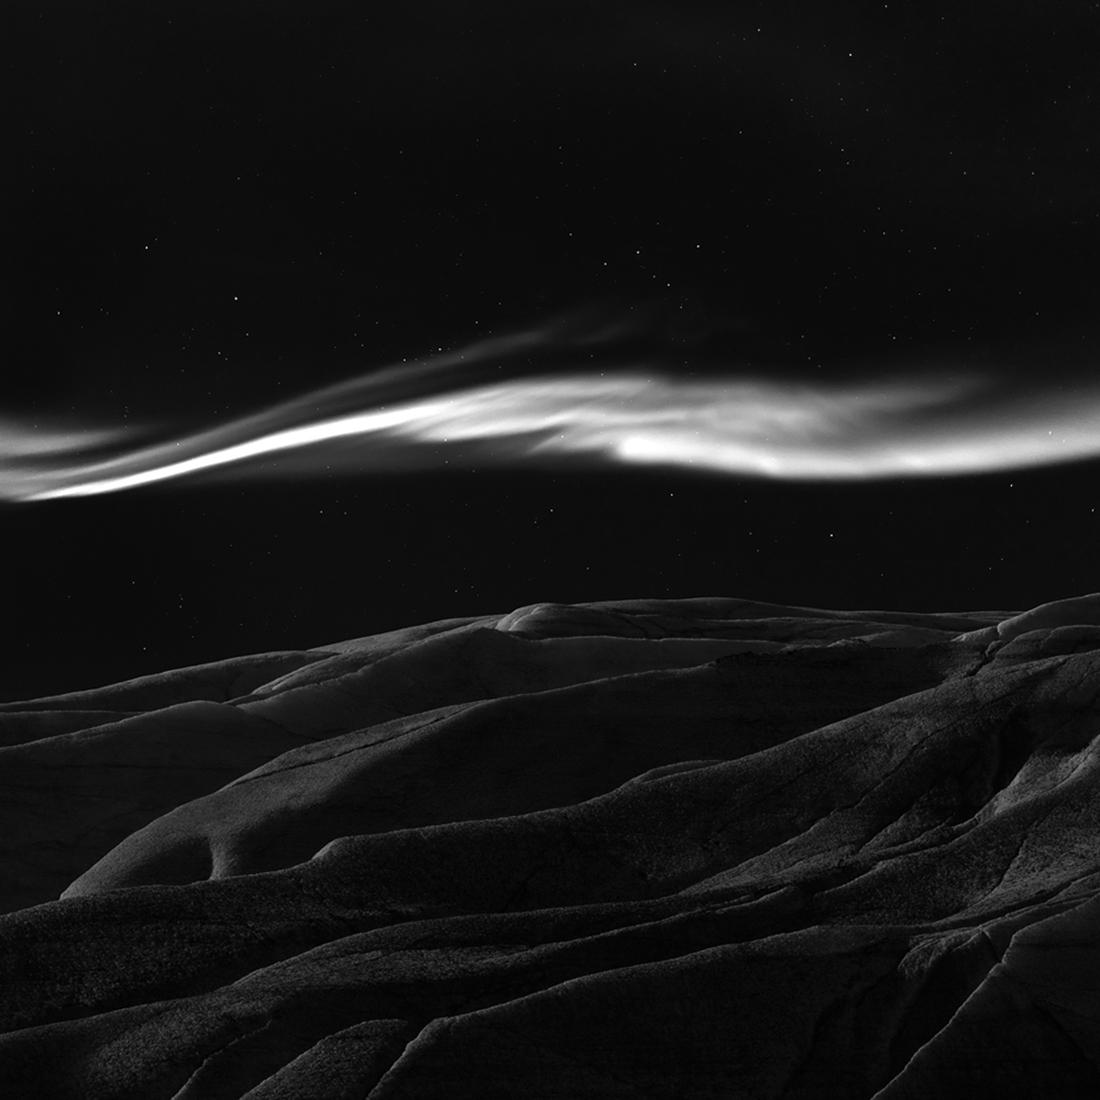 © Patrick Ems: Dancing lights / MonoVisions Photography Awards 2018 winner